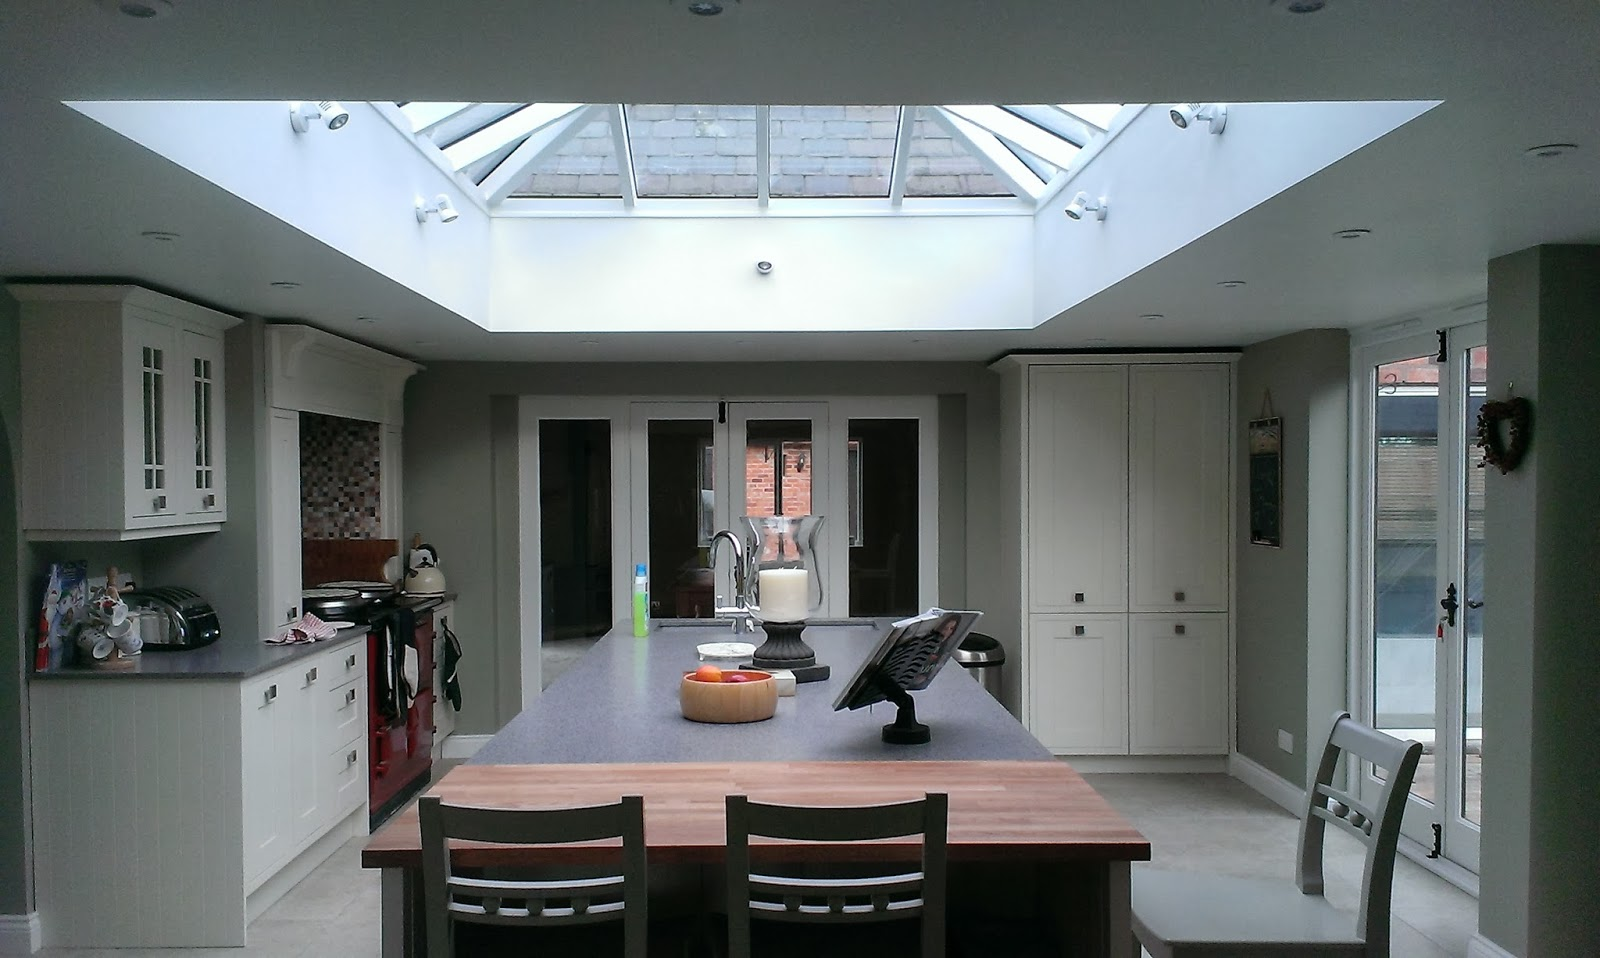 star gazing roof lantern for your home kitchen lantern lights Roof Lantern Lantern Light Kitchen Lisa Melvin Design